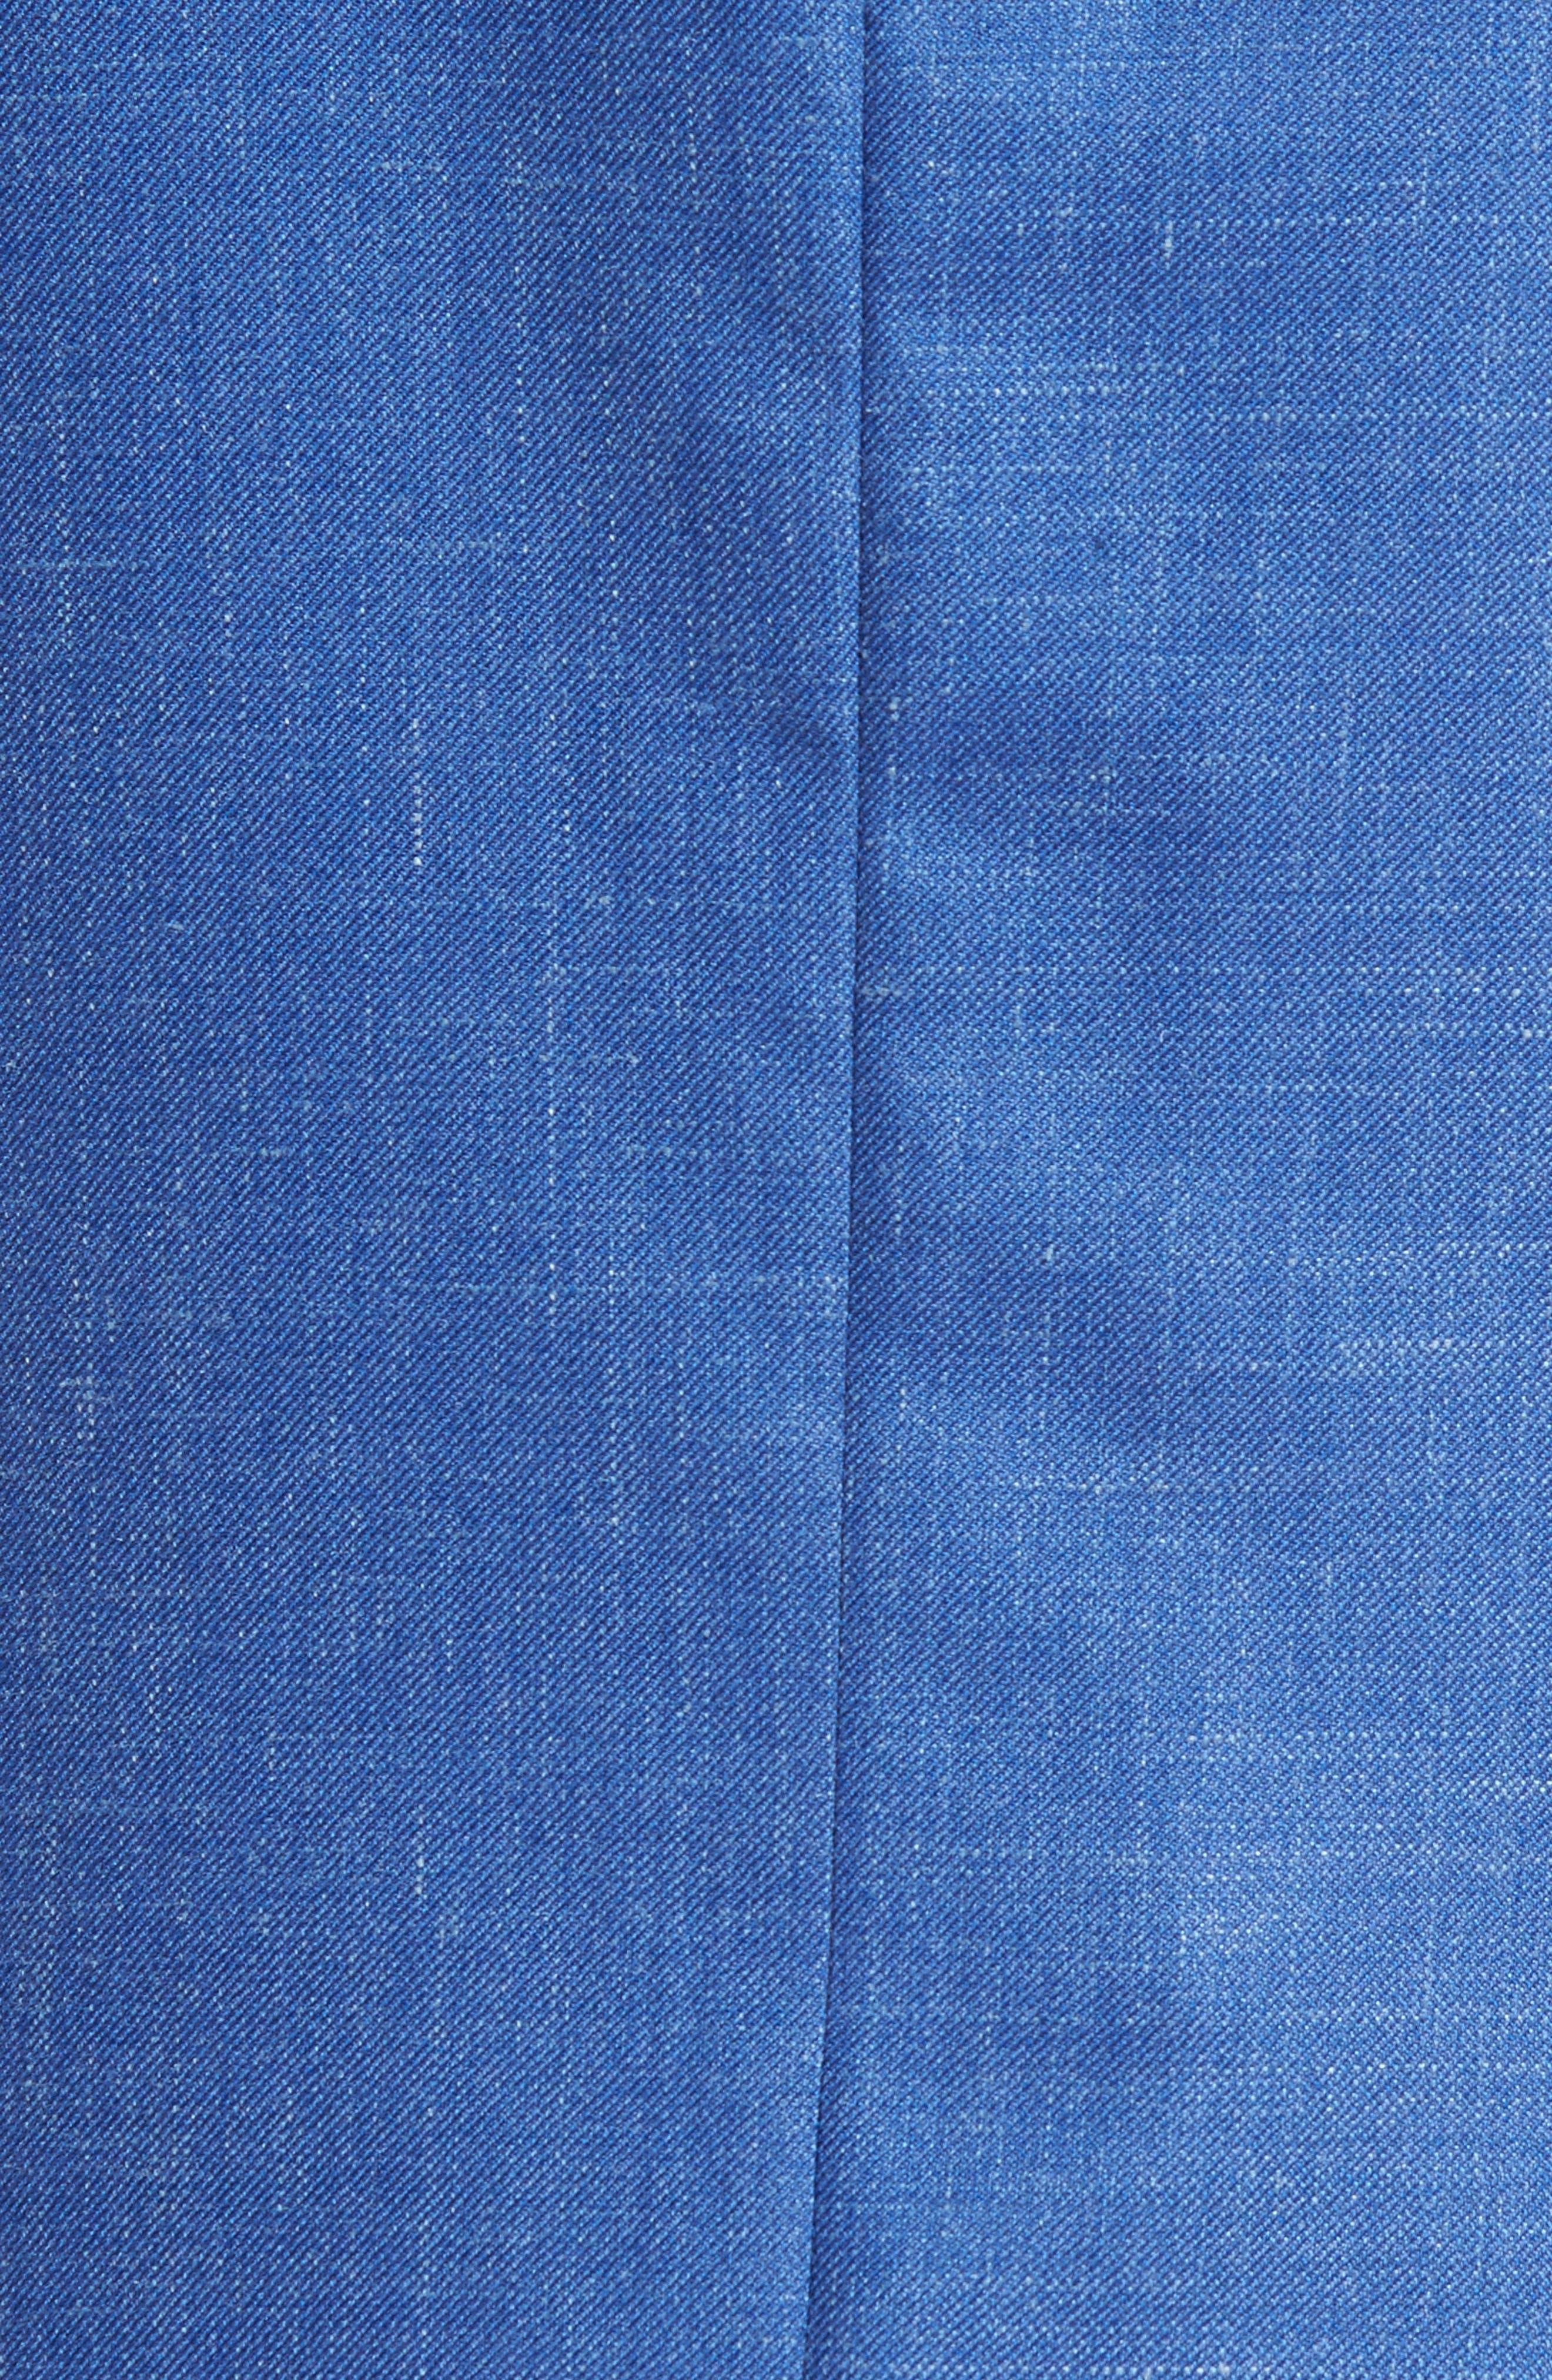 Classic Fit Wool Blend Blazer,                             Alternate thumbnail 5, color,                             Blue